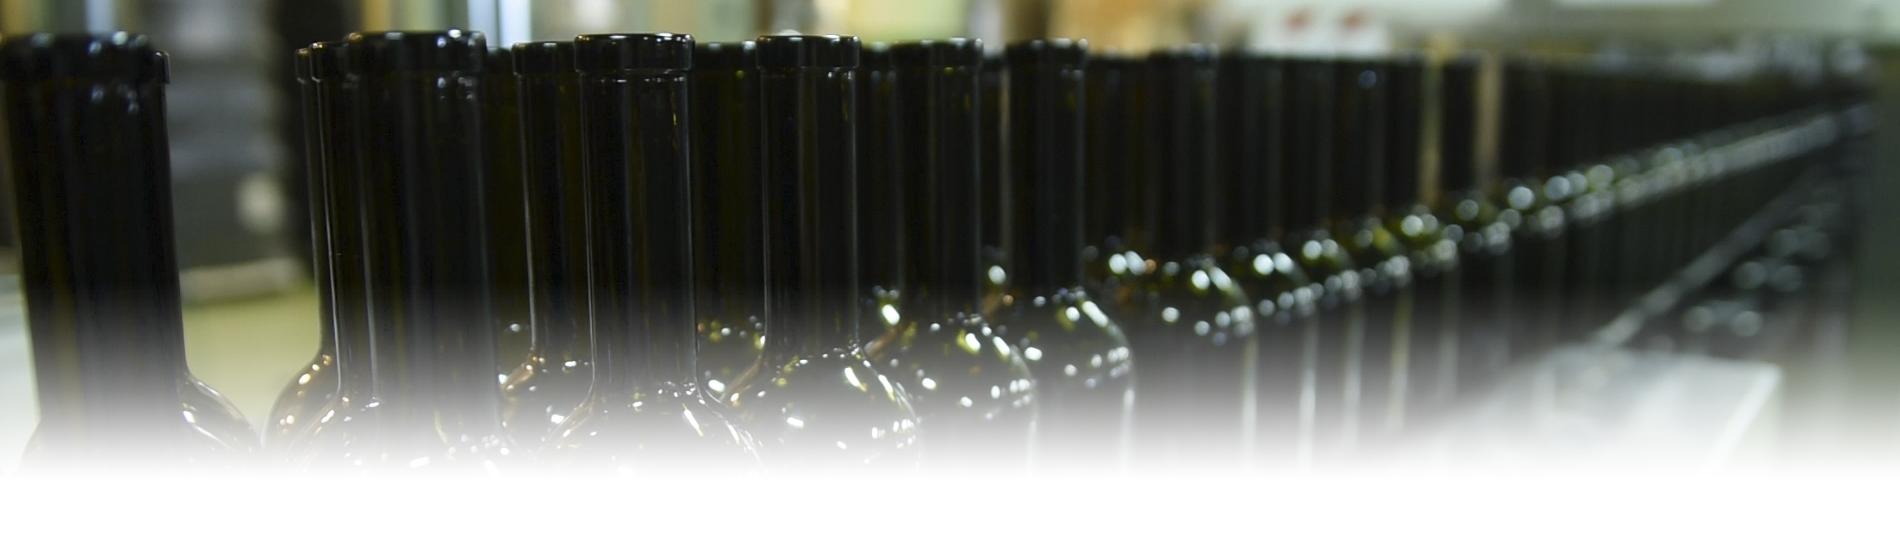 fondo vinos superior